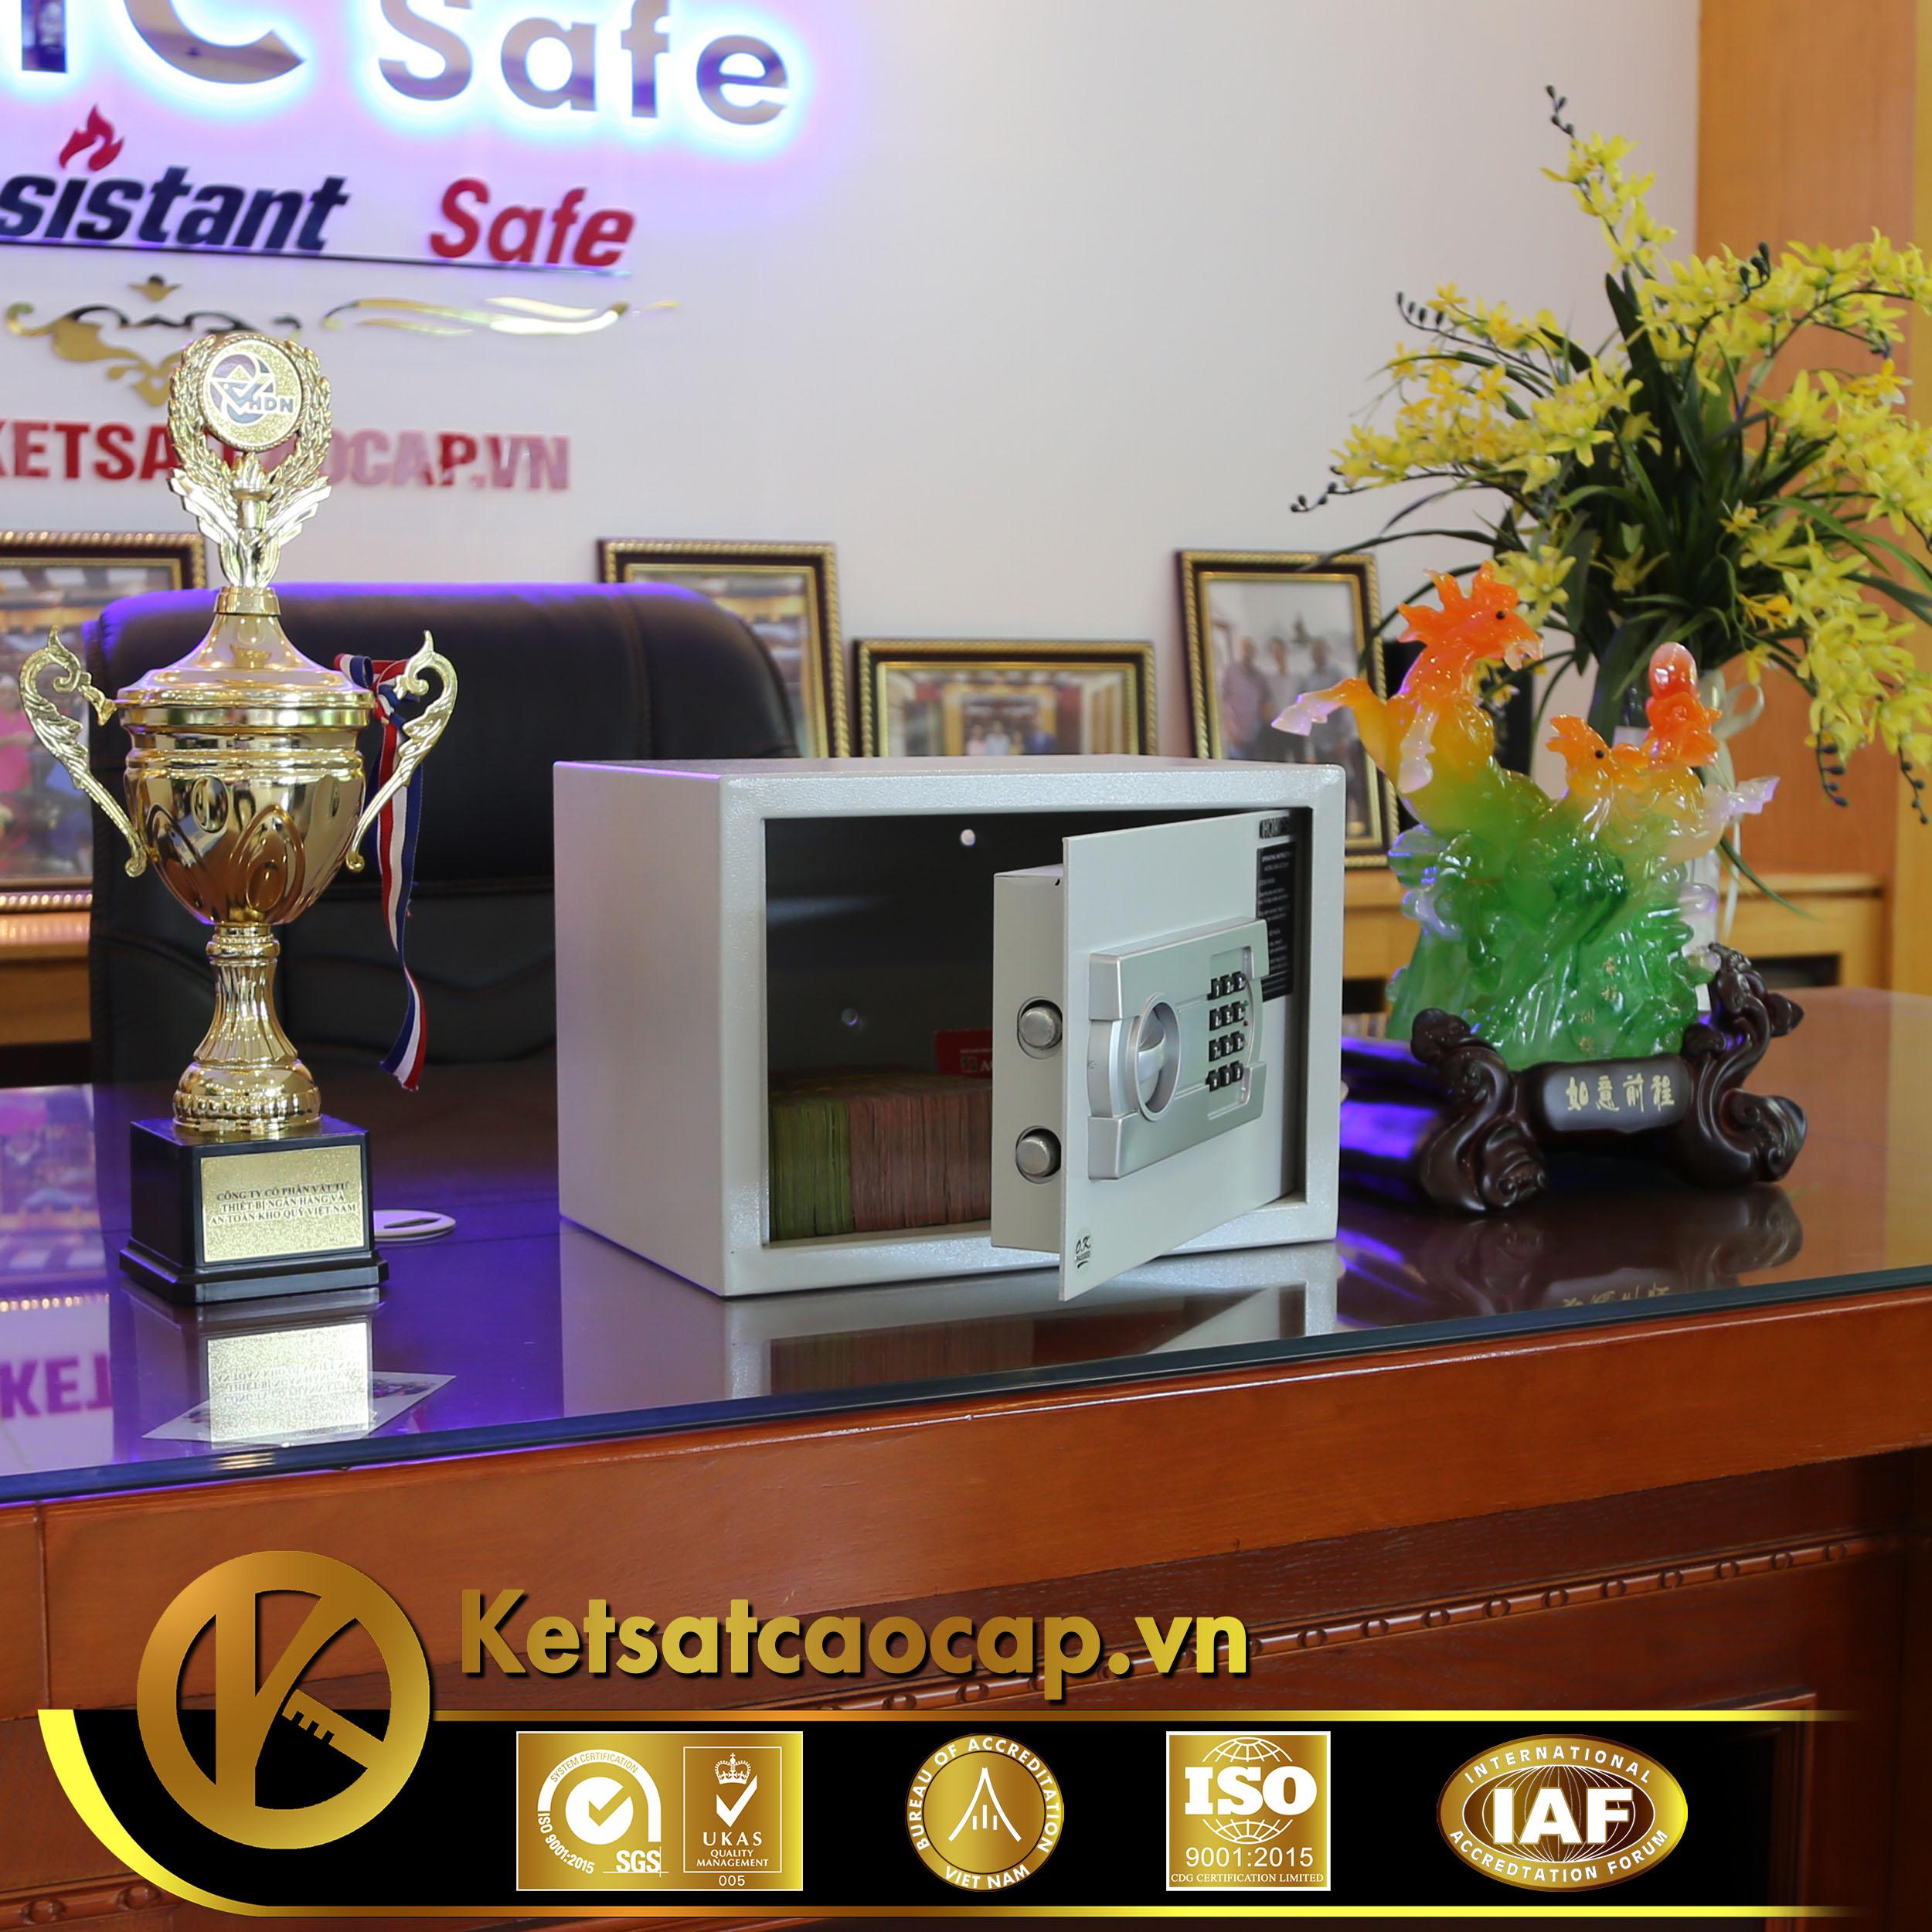 Két sắt khách sạn cao cấp KS421-ACT